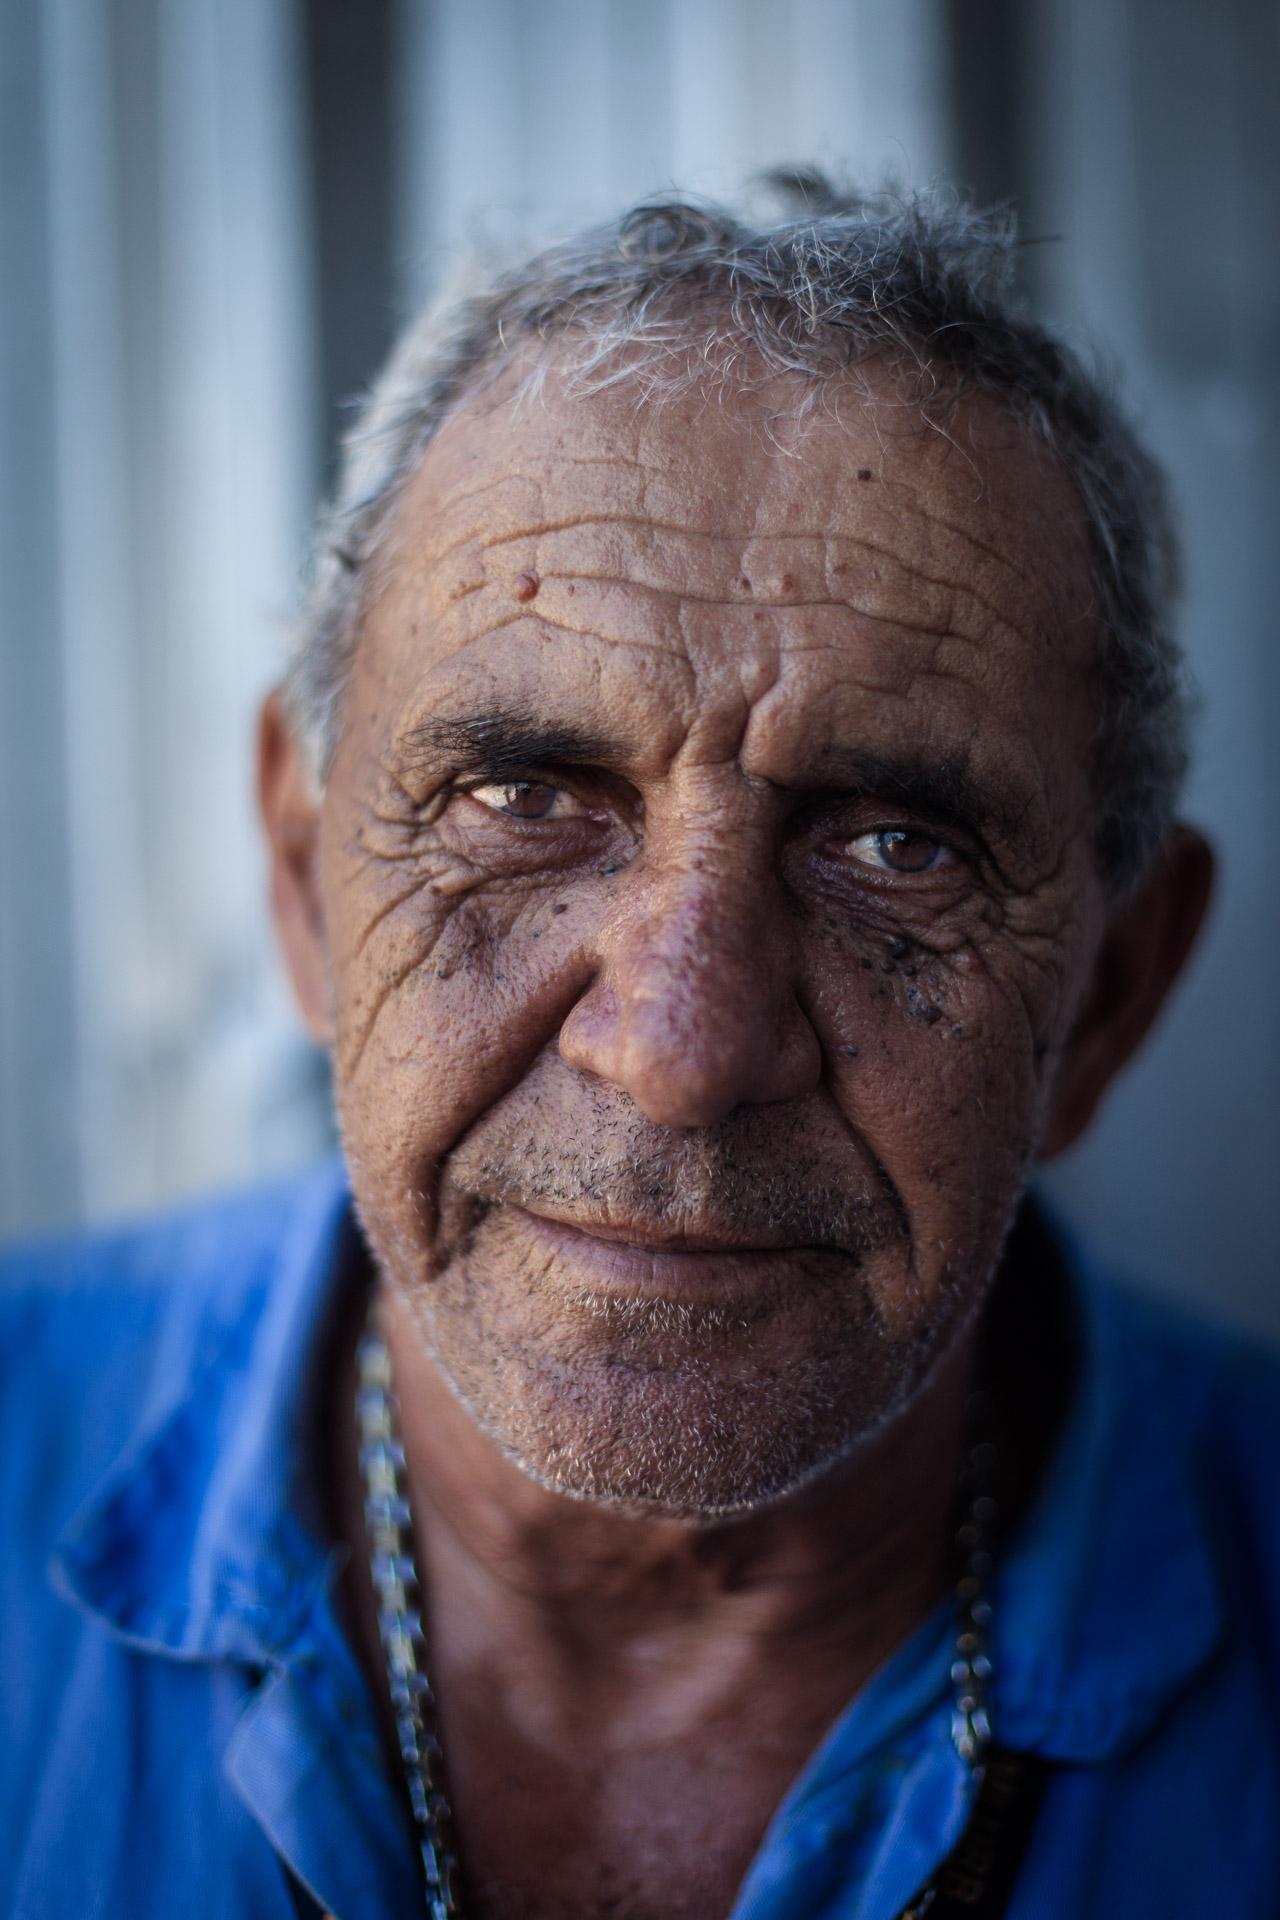 Rio de Janeiro, le 19 Novembre 2013. Edir, 69 ans, travaille au nettoyage de la zone portuaire depuis 1975.Rio de Janeiro, November 19, 2013. Edir, 69, works at cleaning the port area since 1975.